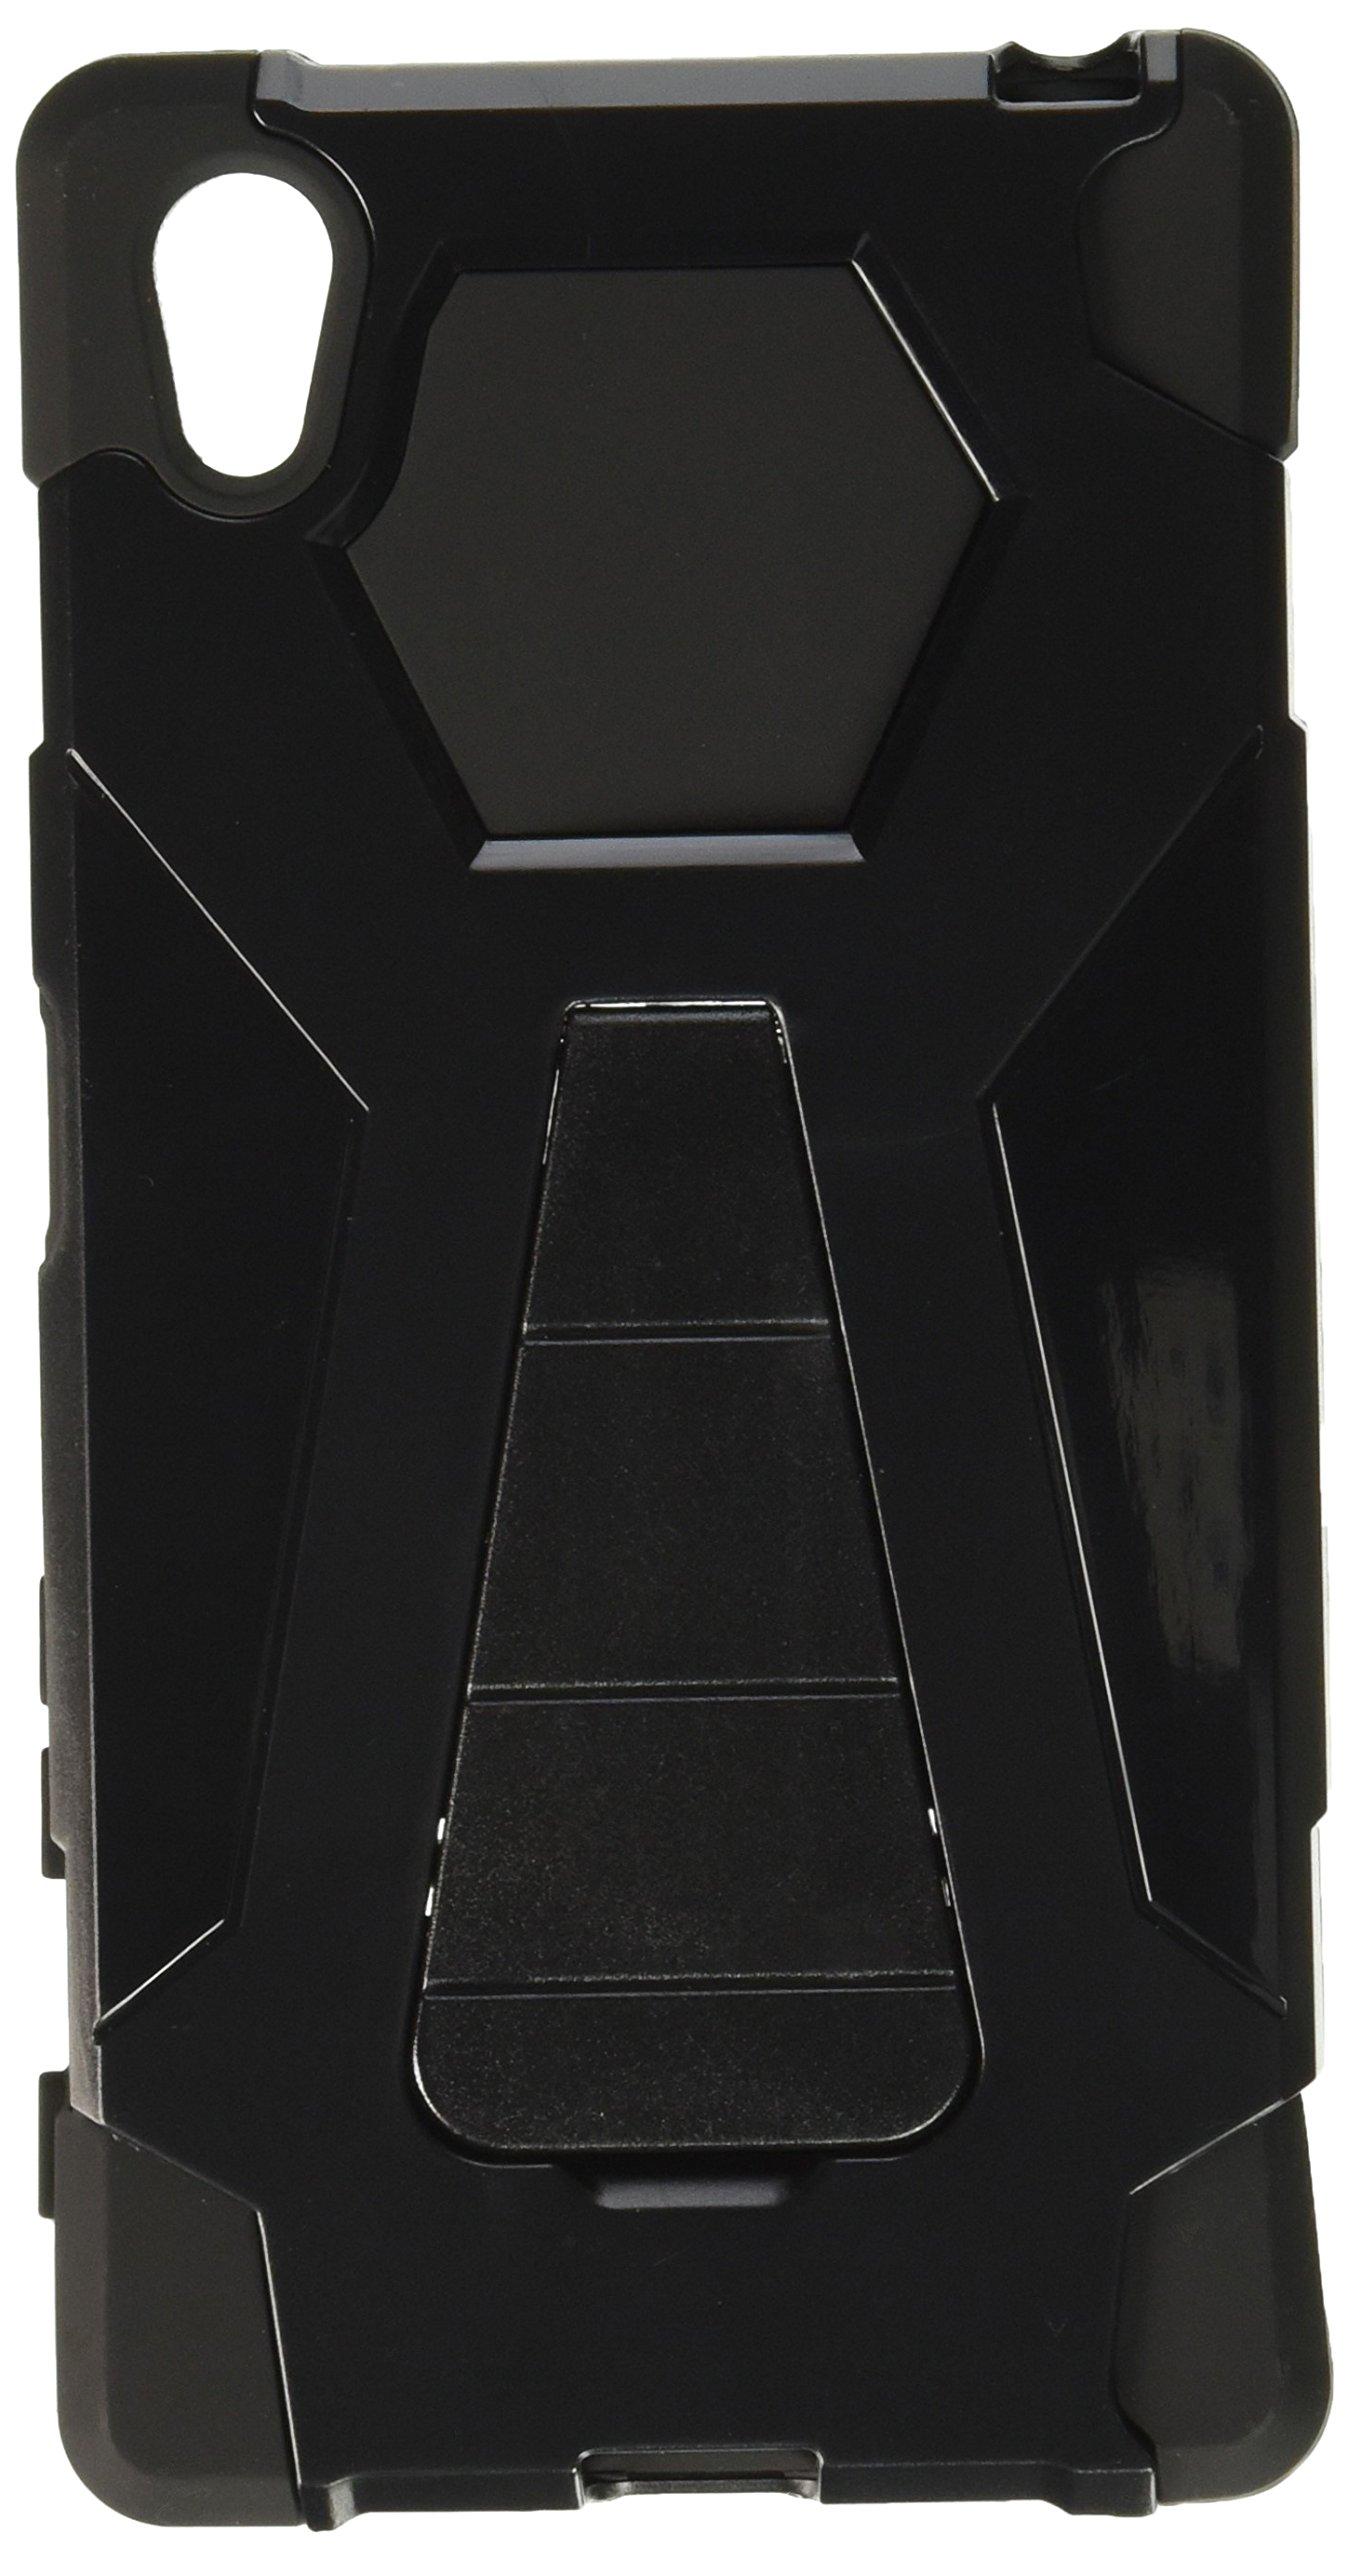 Funda Para Sony Xperia Z5 Asmyna [16r78y3y]